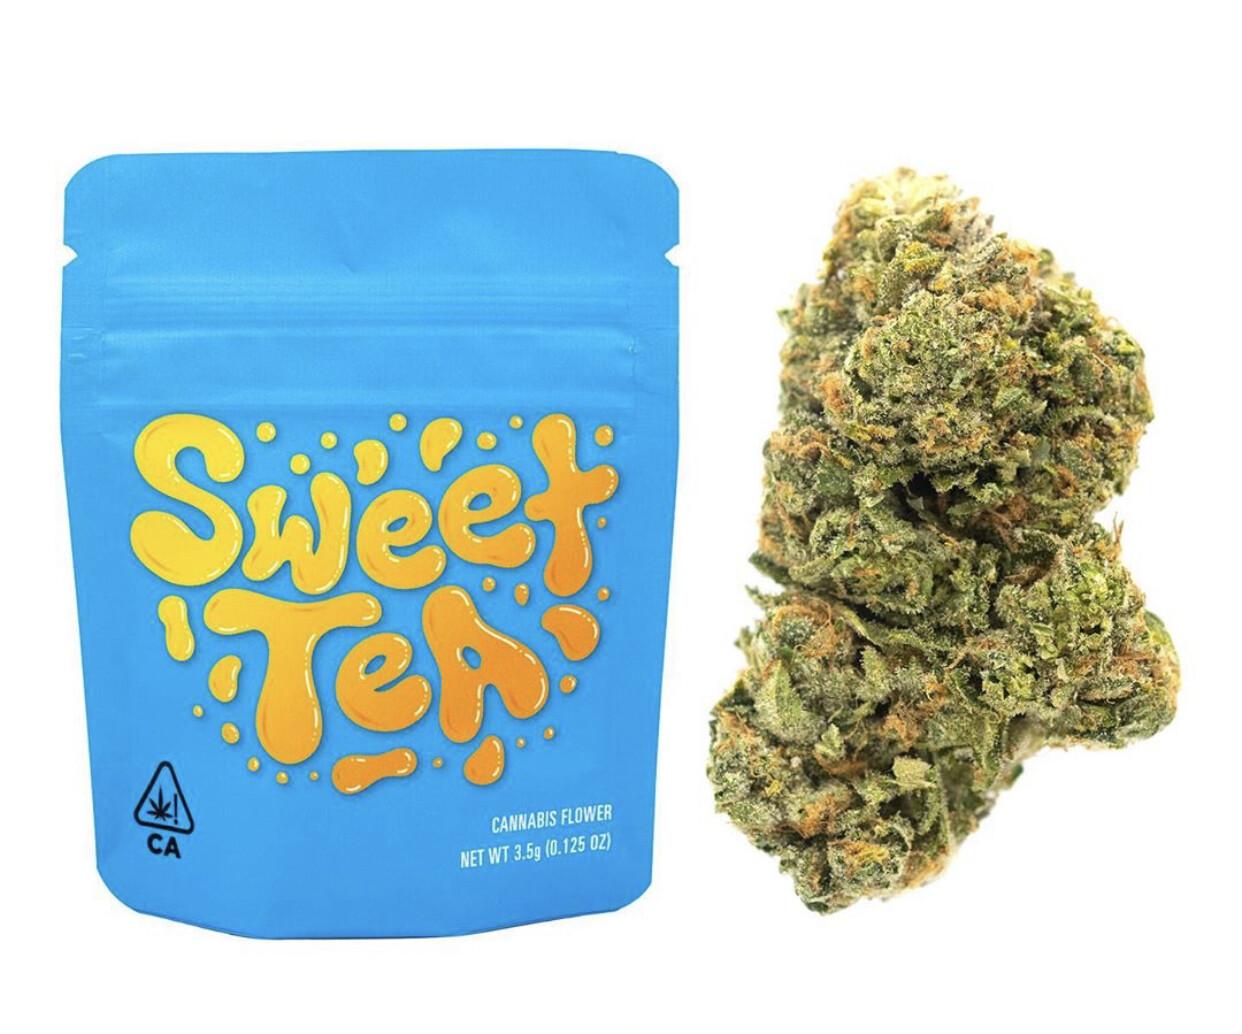 sweat tea cookies strain